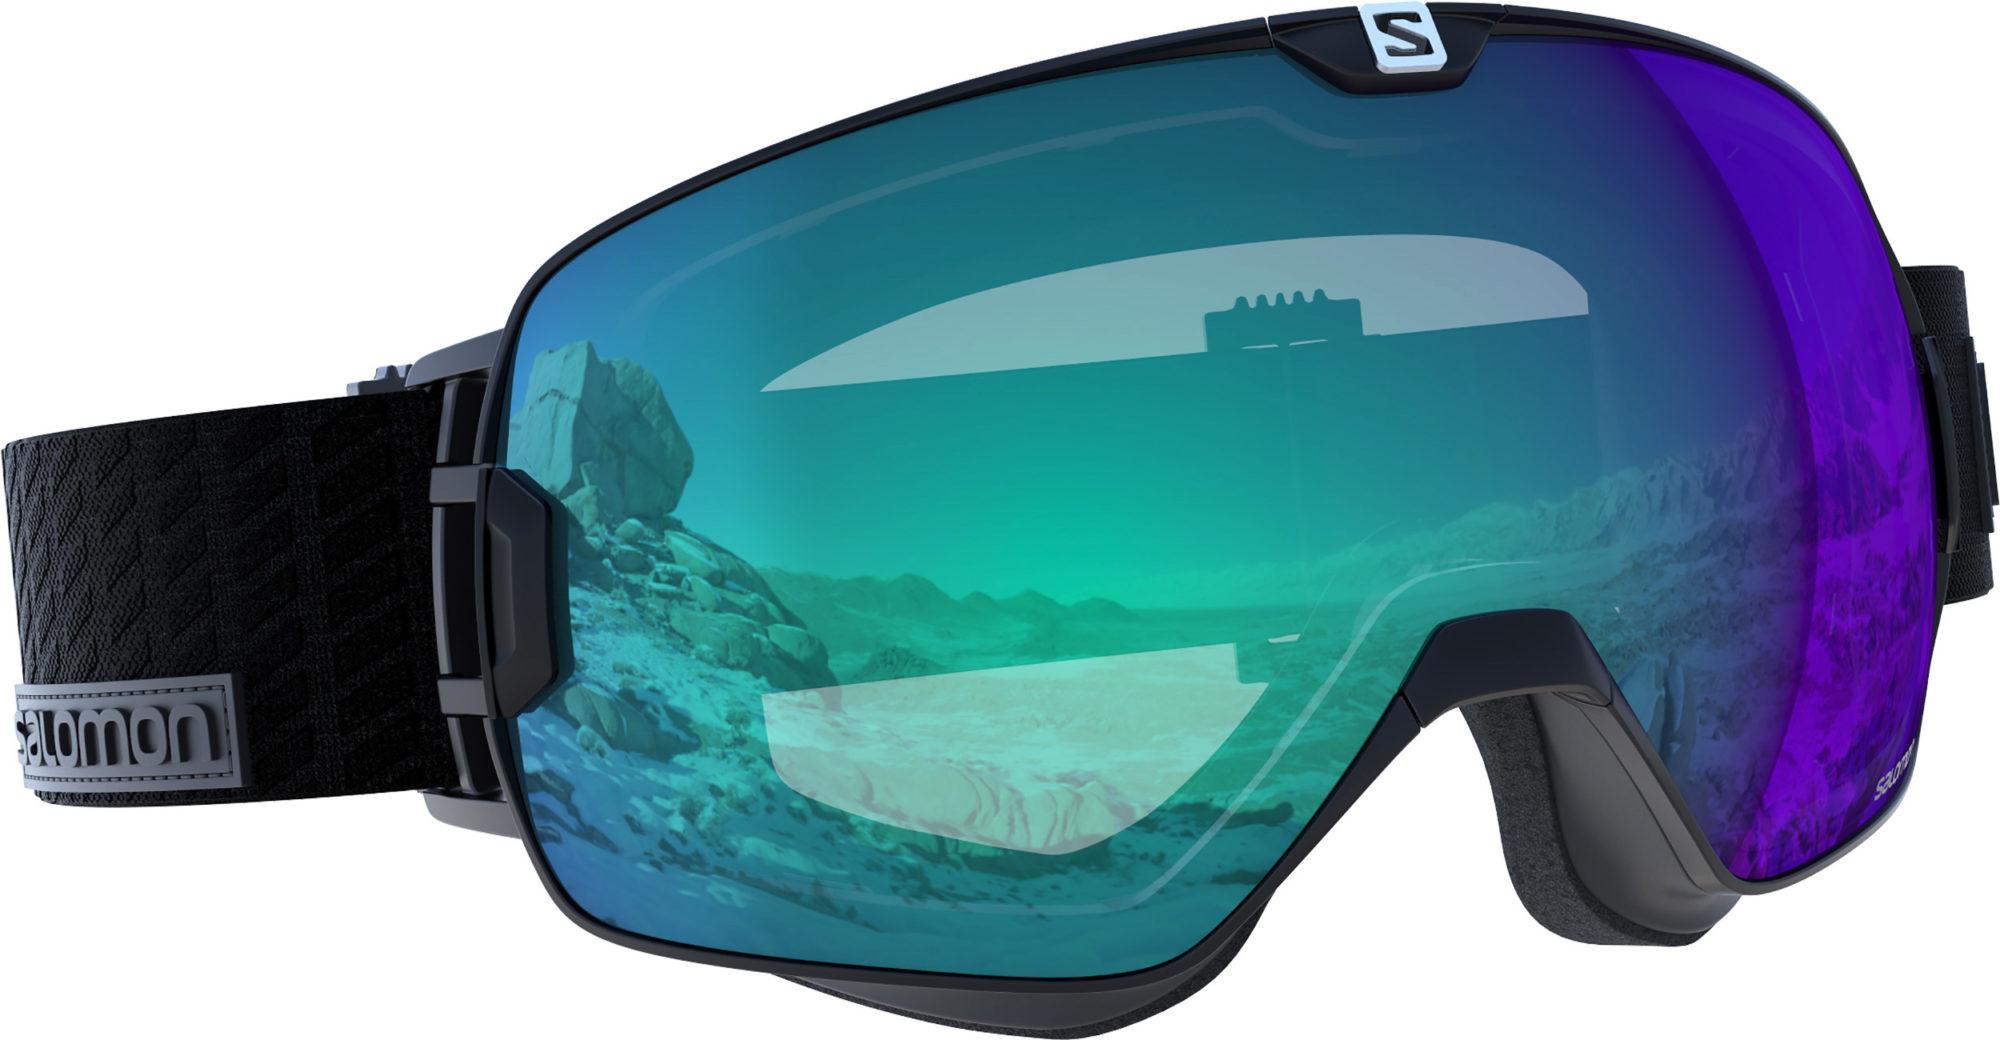 Salomons goggles Xmax Photo Black får dig att se bra ut. Foto  Salomon Xmax  Photo Black d3bc919f3092c